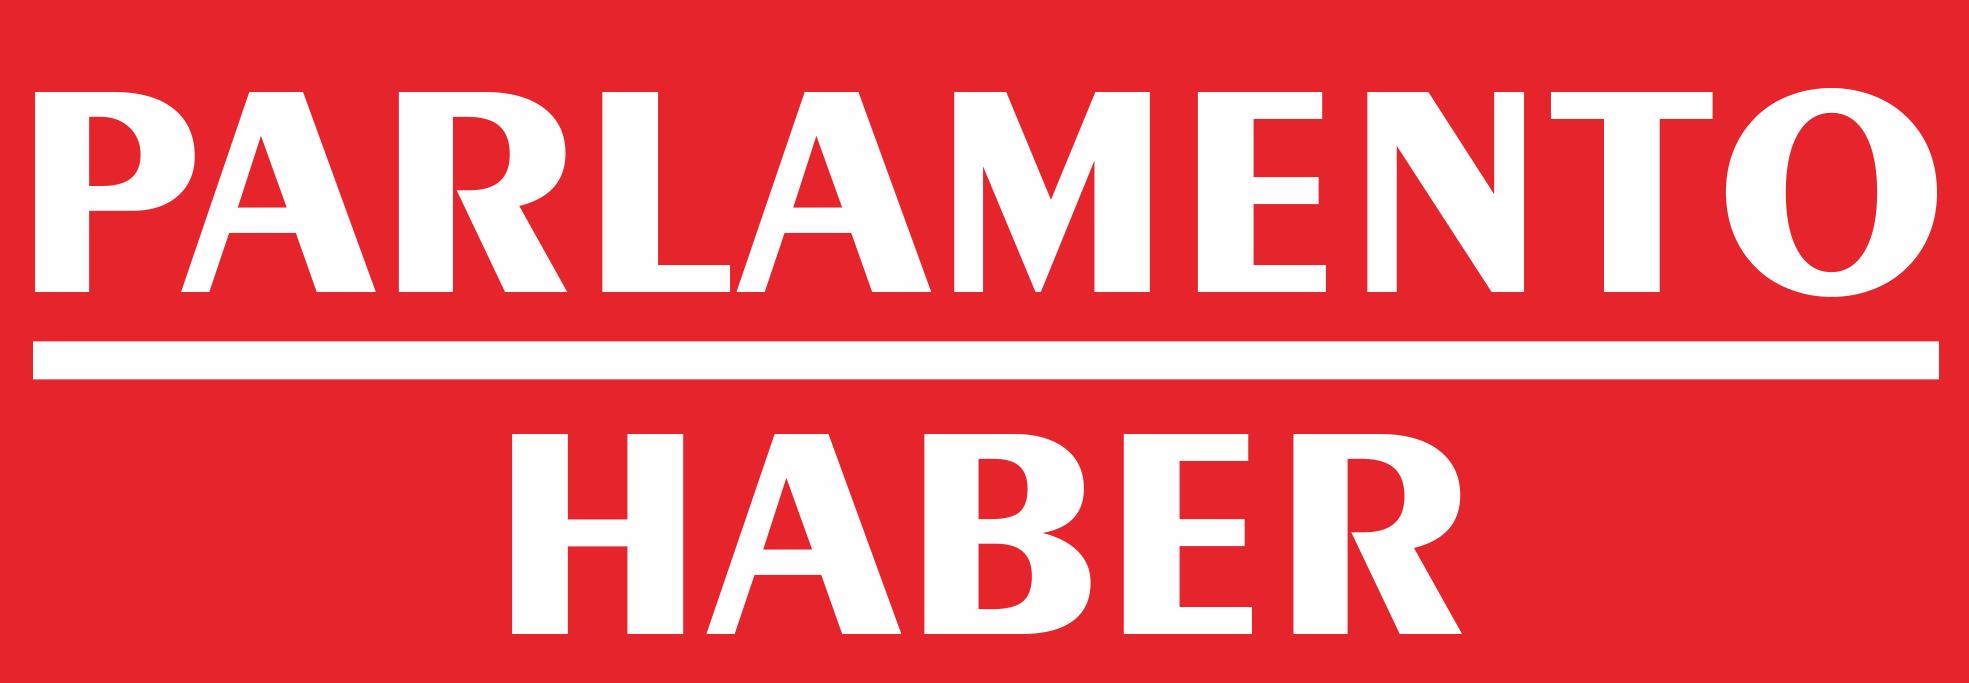 Parlamento Haber